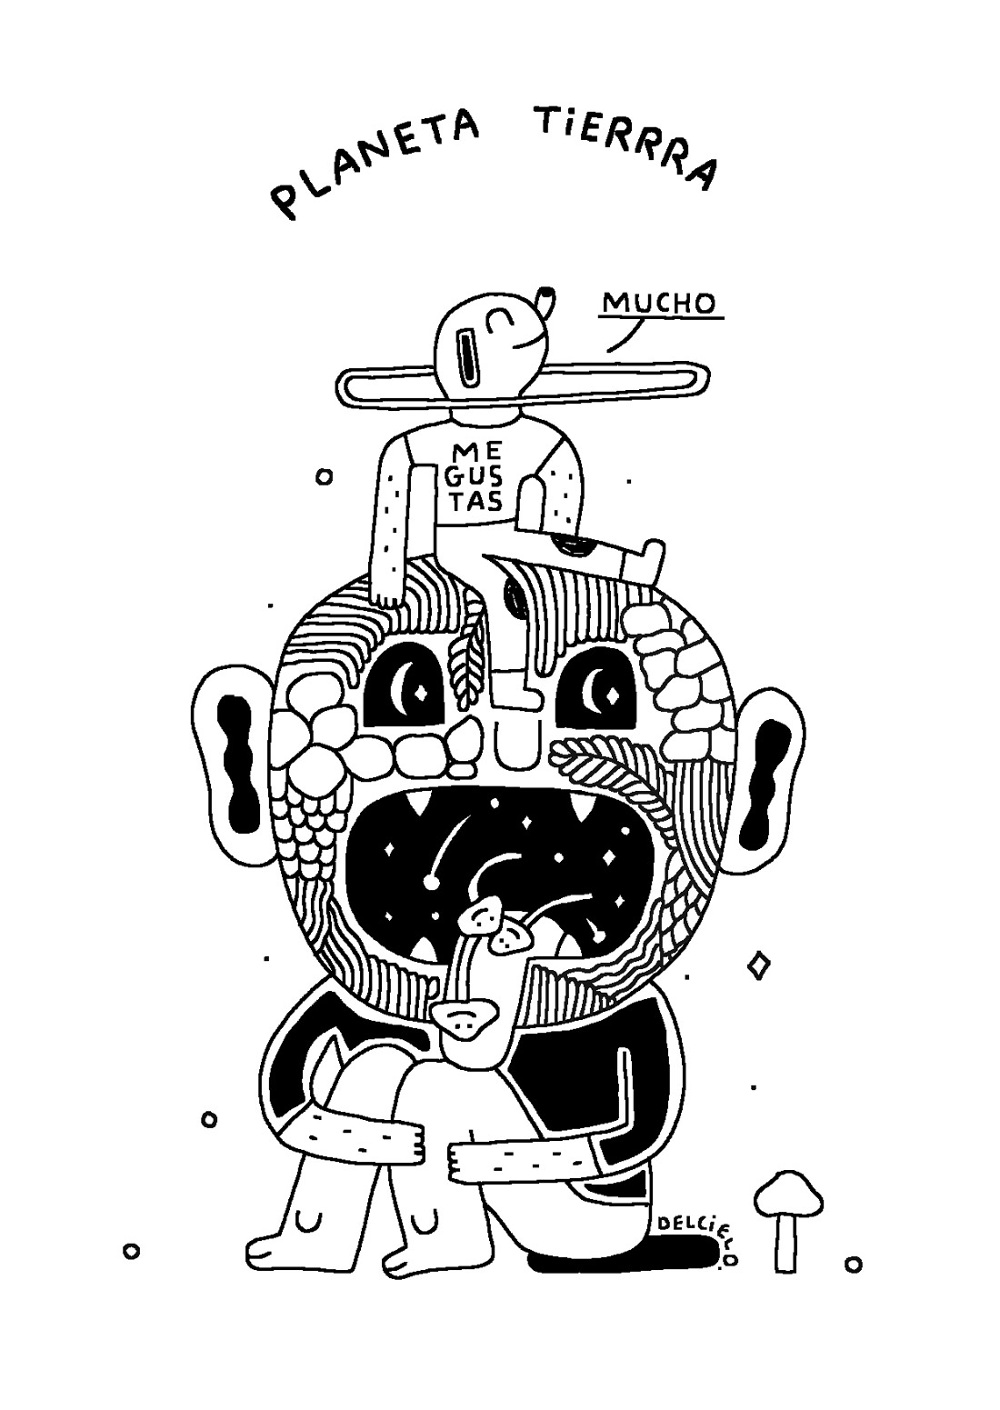 Black White Drawings Pablo Delcielo Illustrator